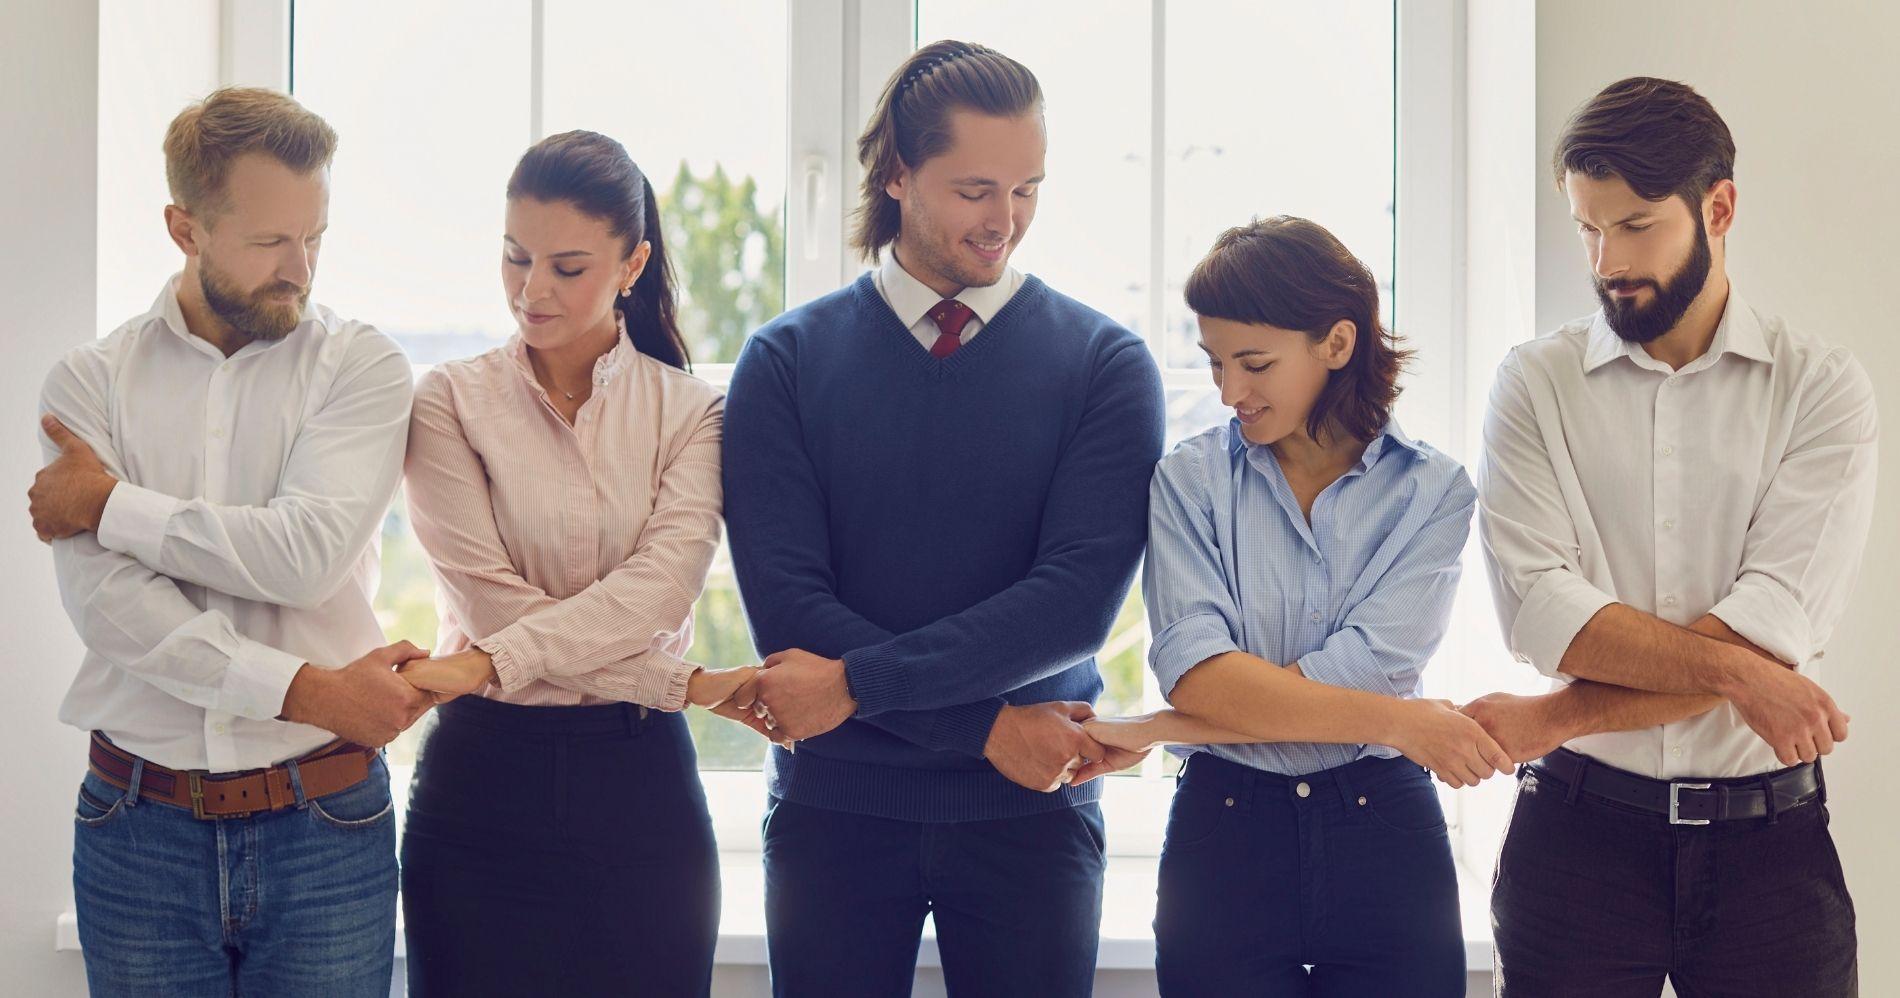 Retensi Karyawan Perusahaan - Bisnis Muda - Image: canva.com